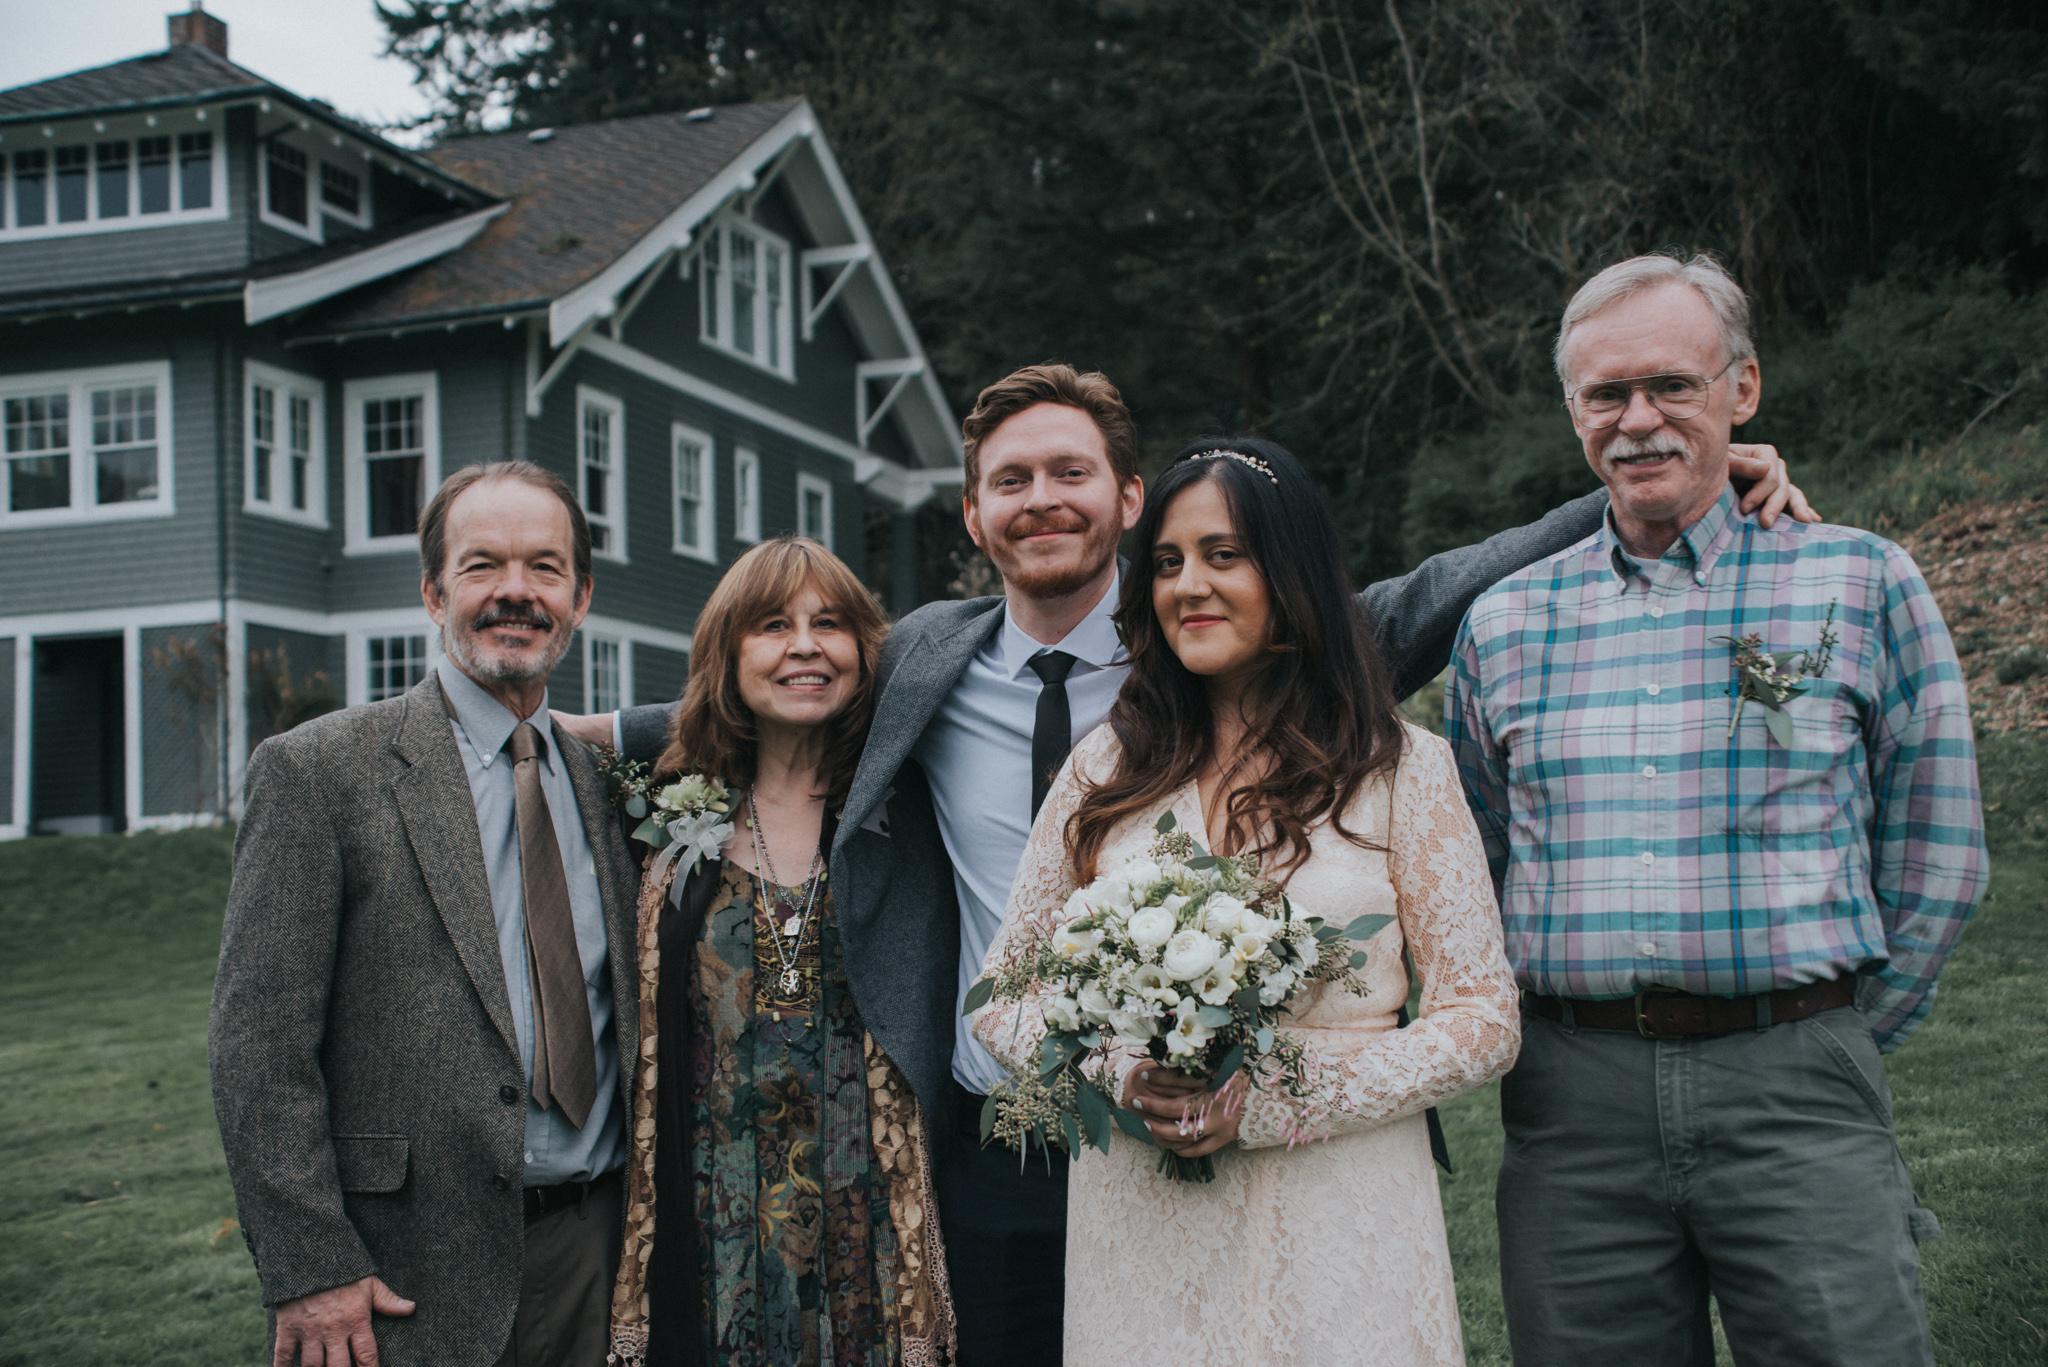 Bellingham wedding Woodstock Farms Vishal Goklani Seattle Wedding Photographer028.JPG